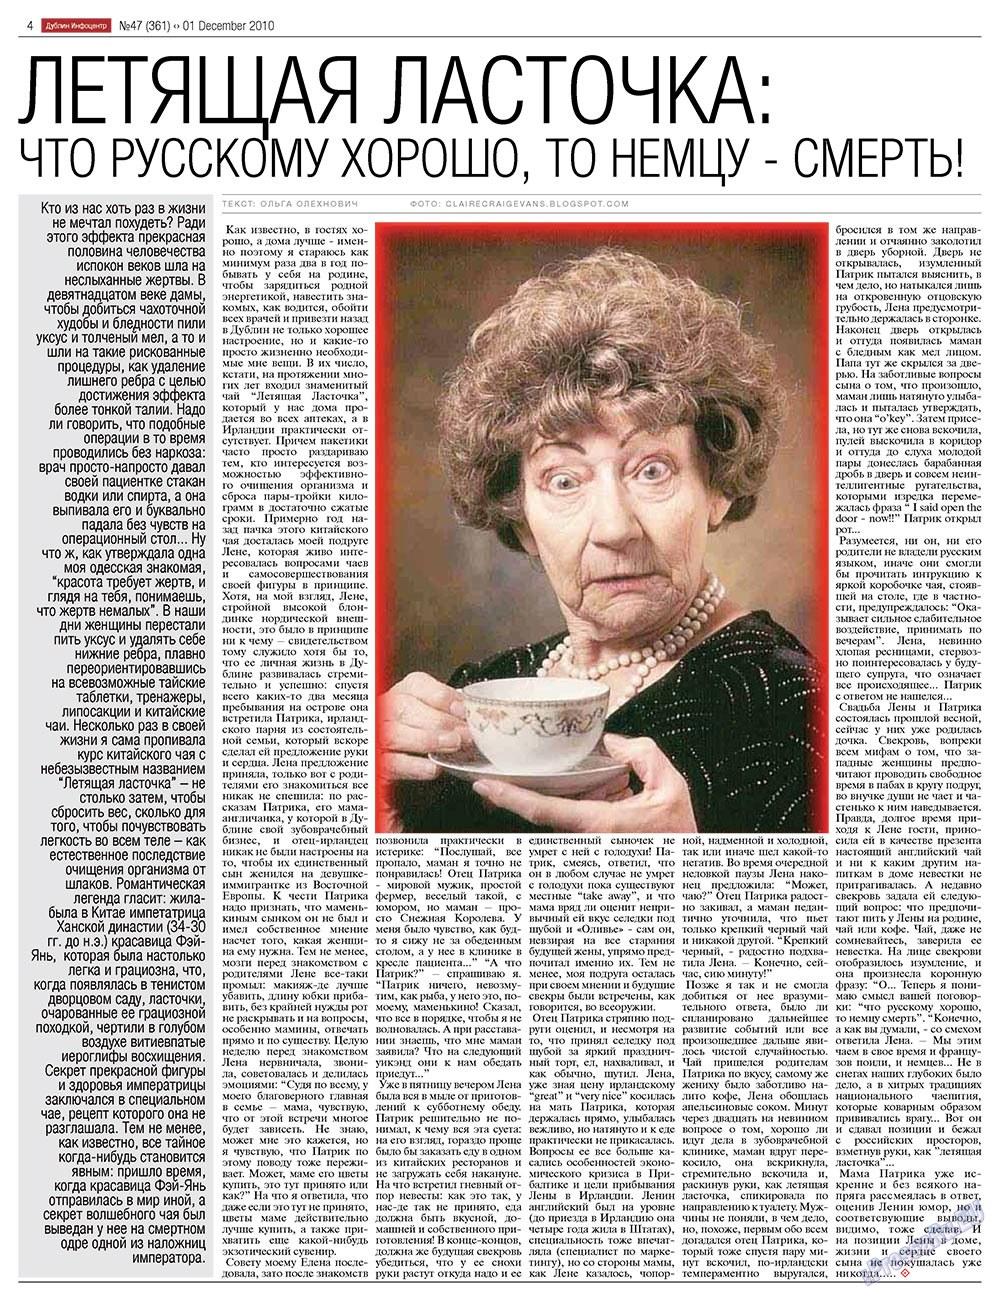 Дублин инфоцентр (газета). 2010 год, номер 47, стр. 4